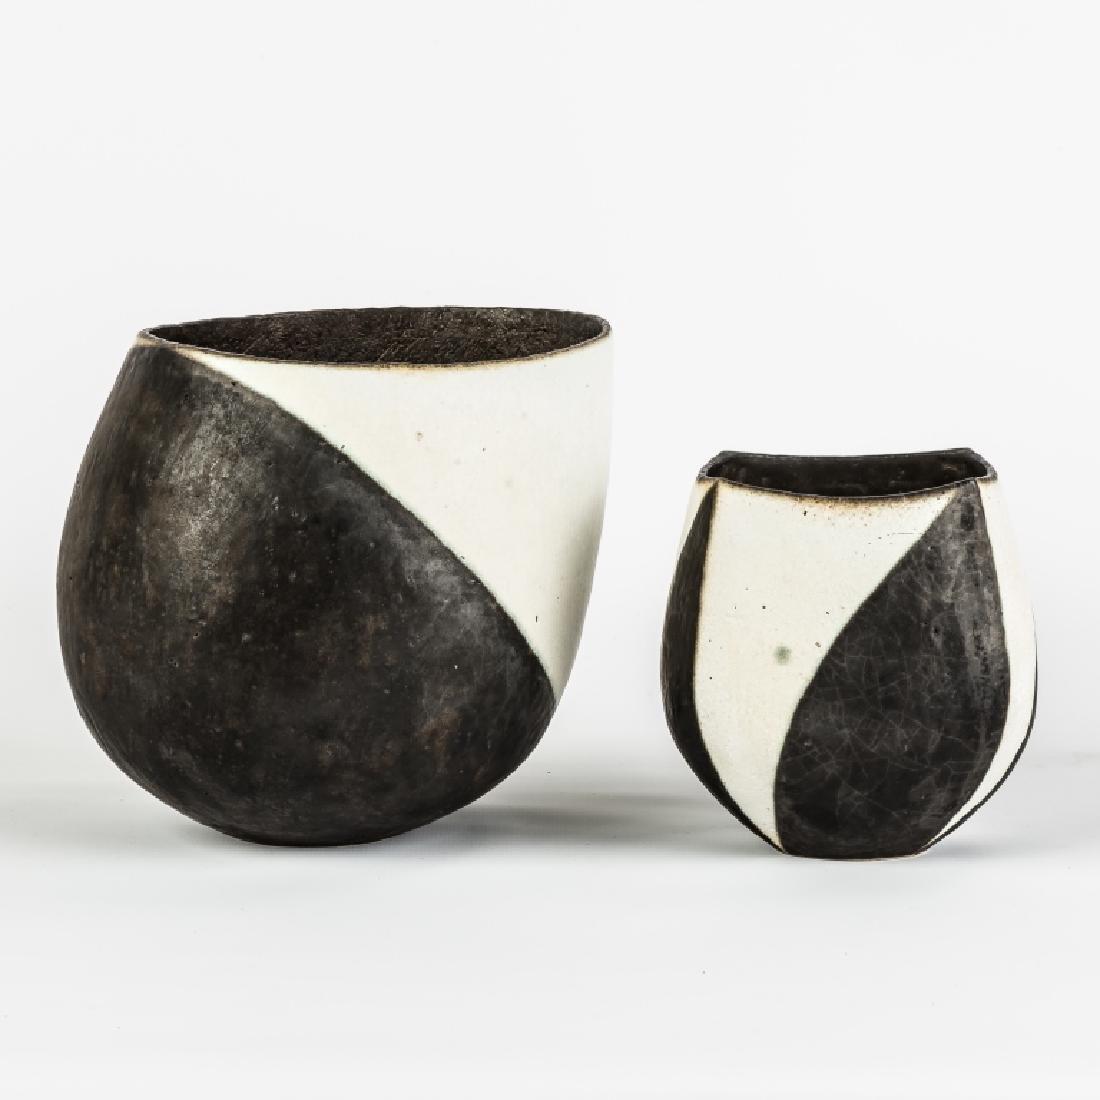 John Ward (English, B. 1938) Two Black and White Vases